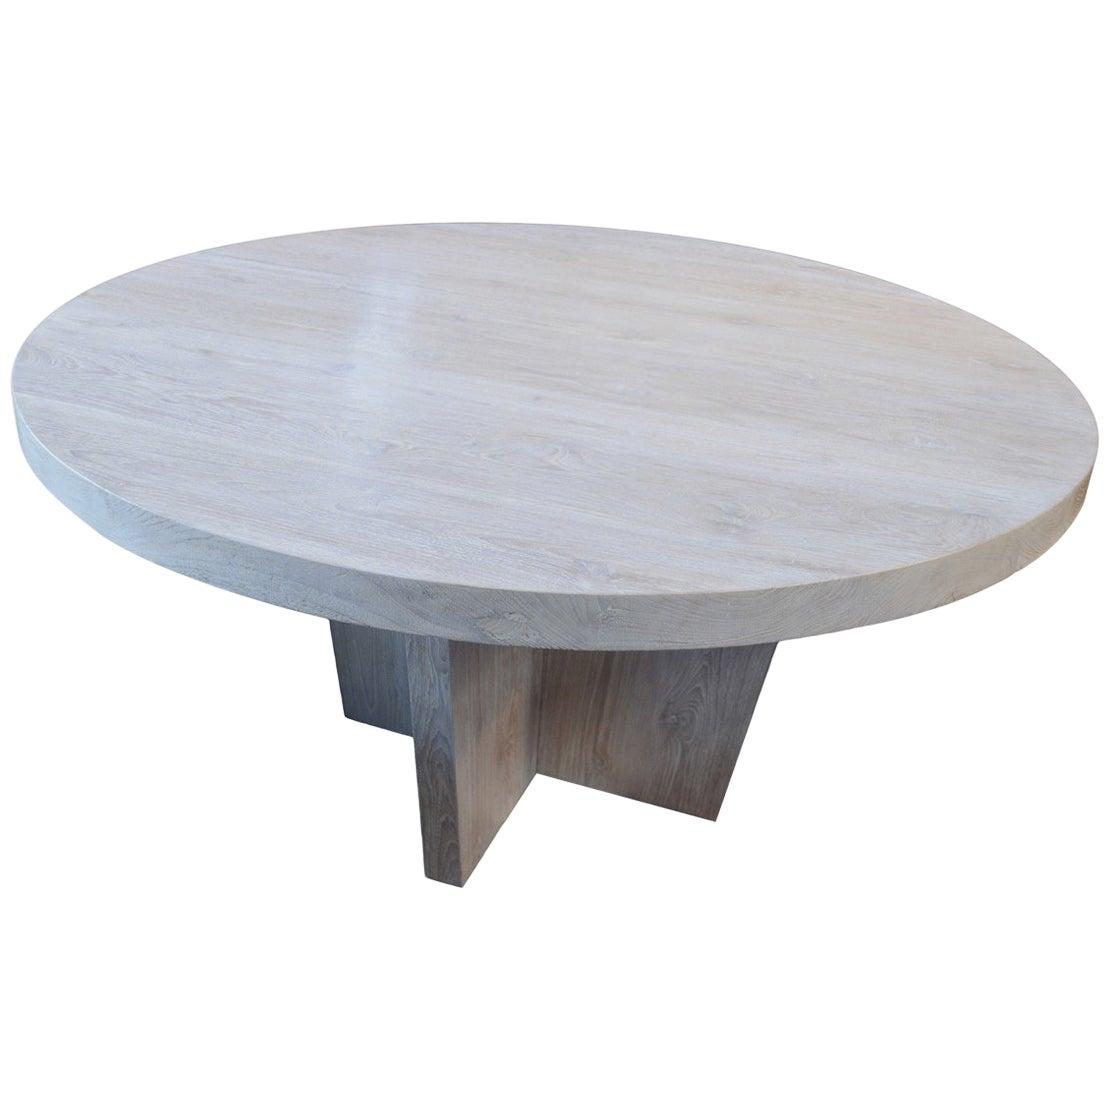 Round St. Barts Teak Wood Dining Table